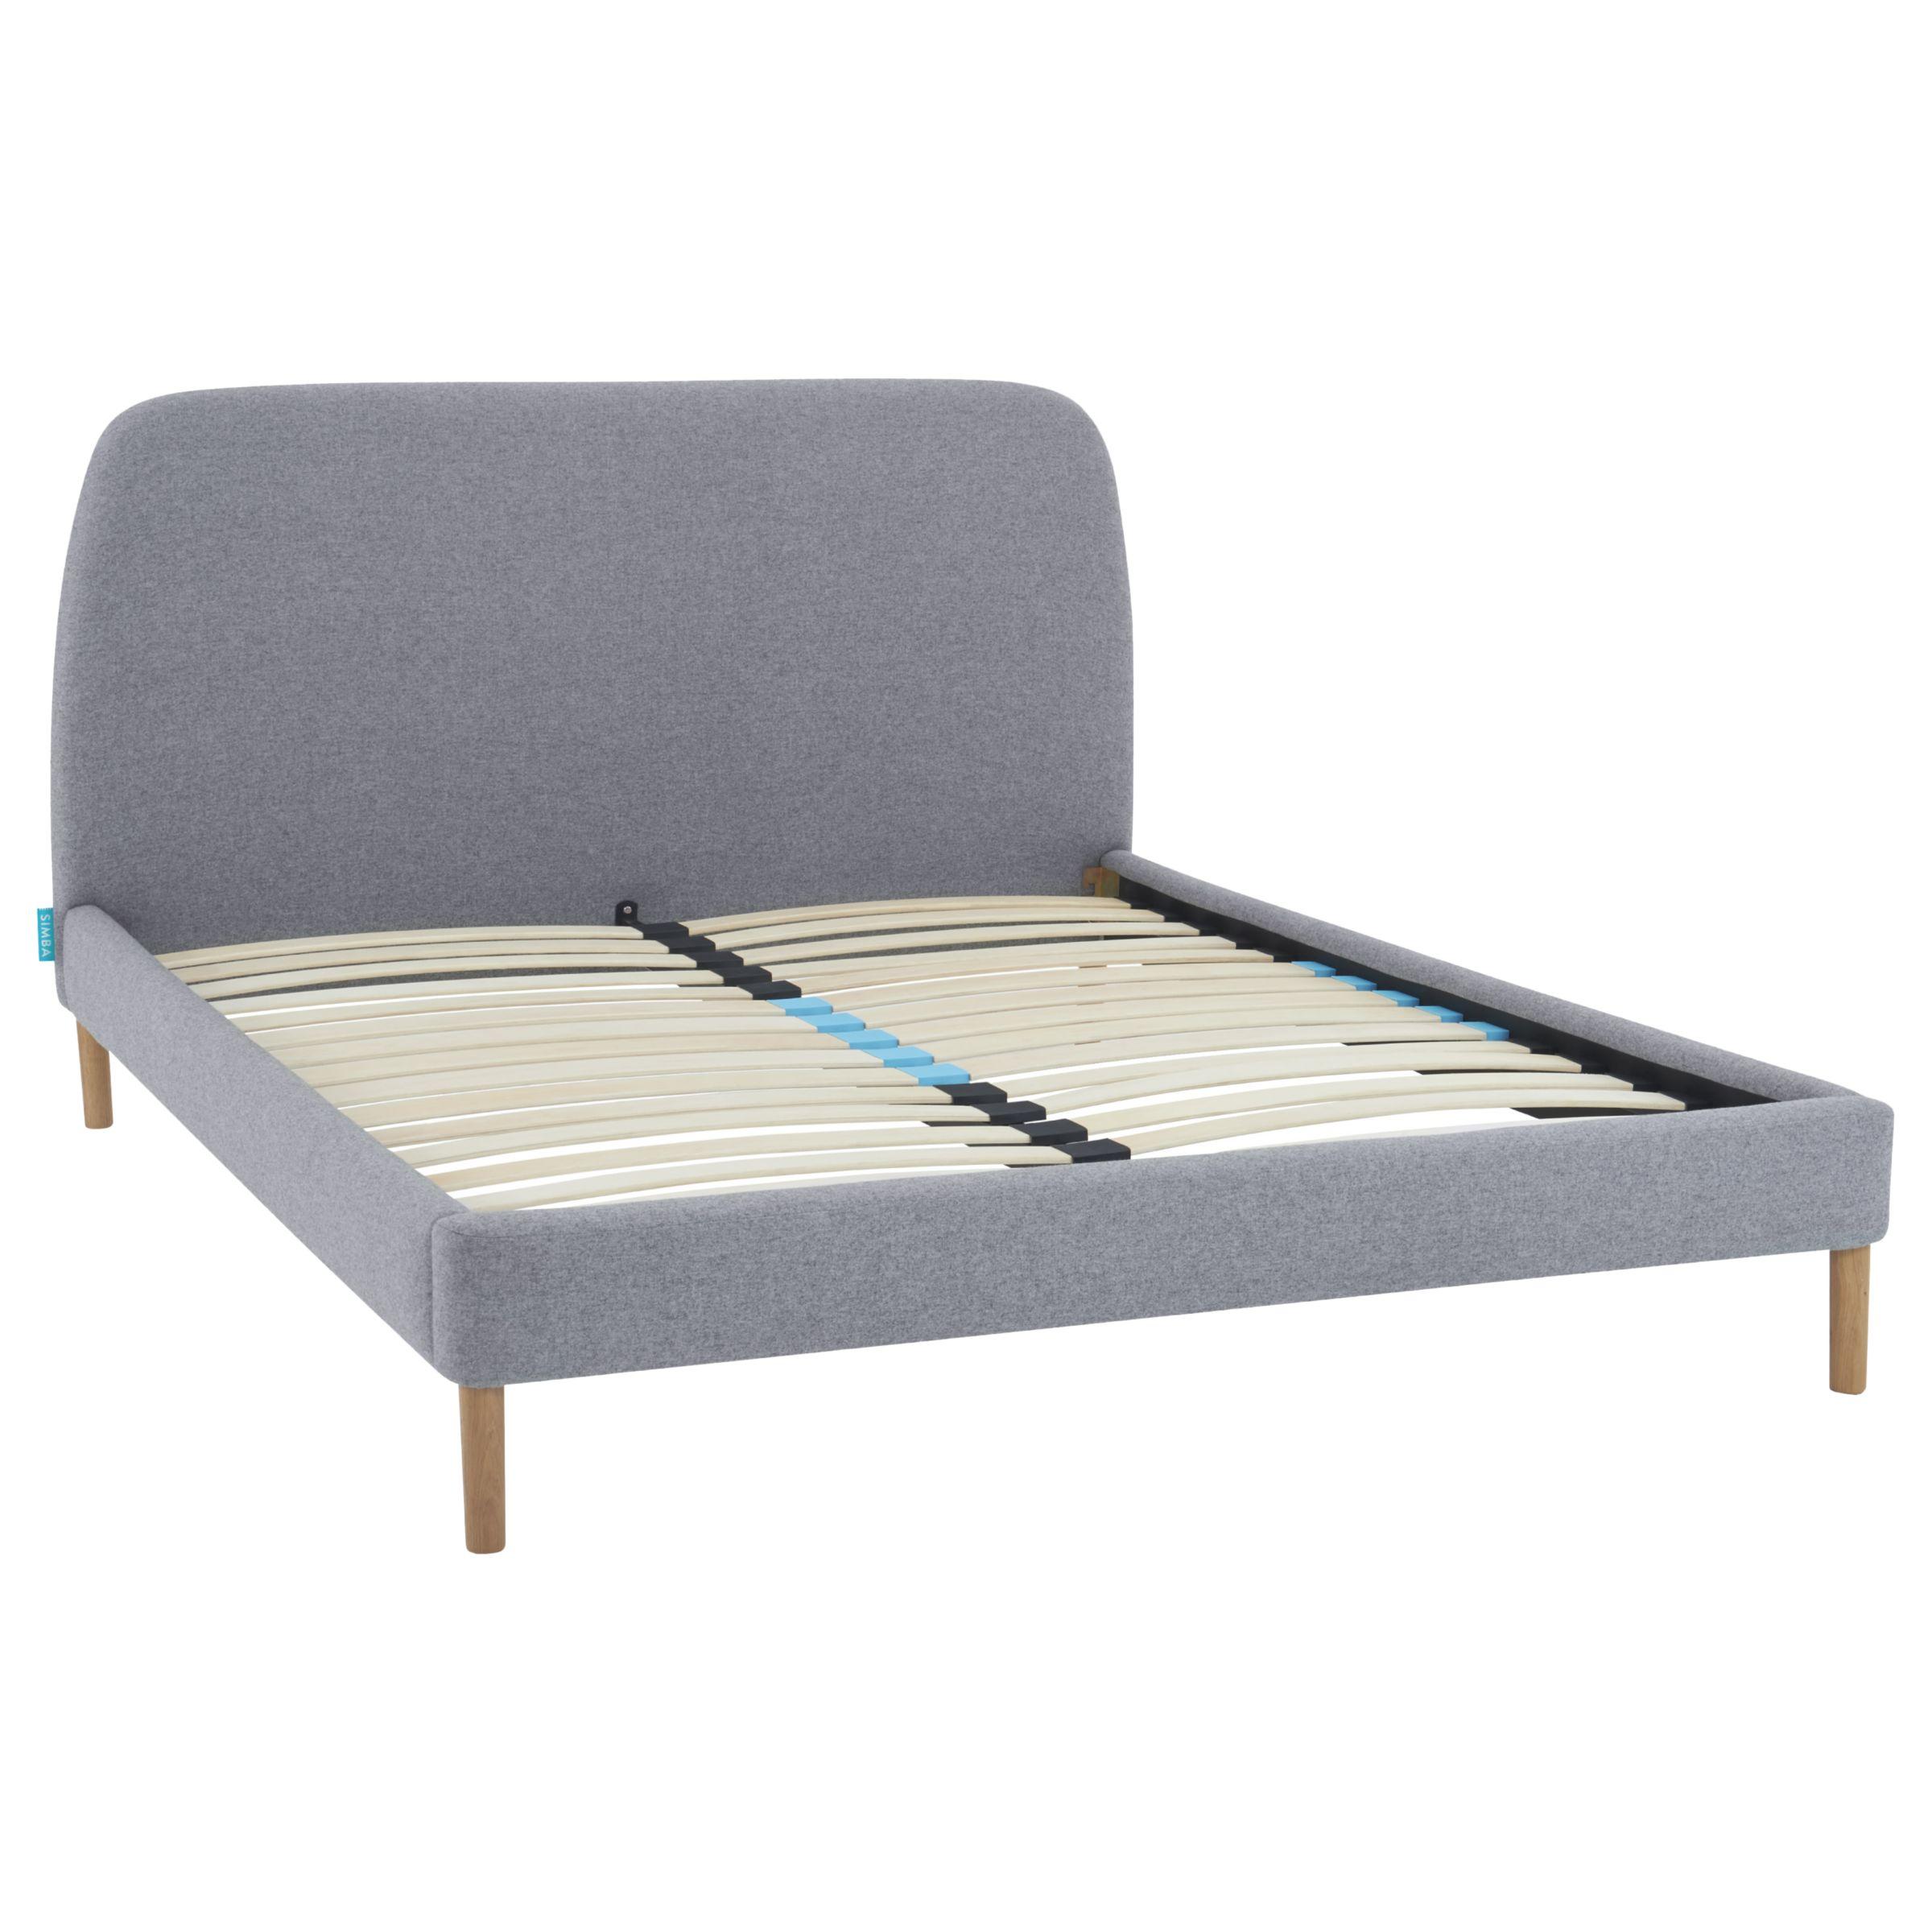 Simba SIMBA Hybrid® Upholstered Bed Frame with Headboard, King Size, Grey